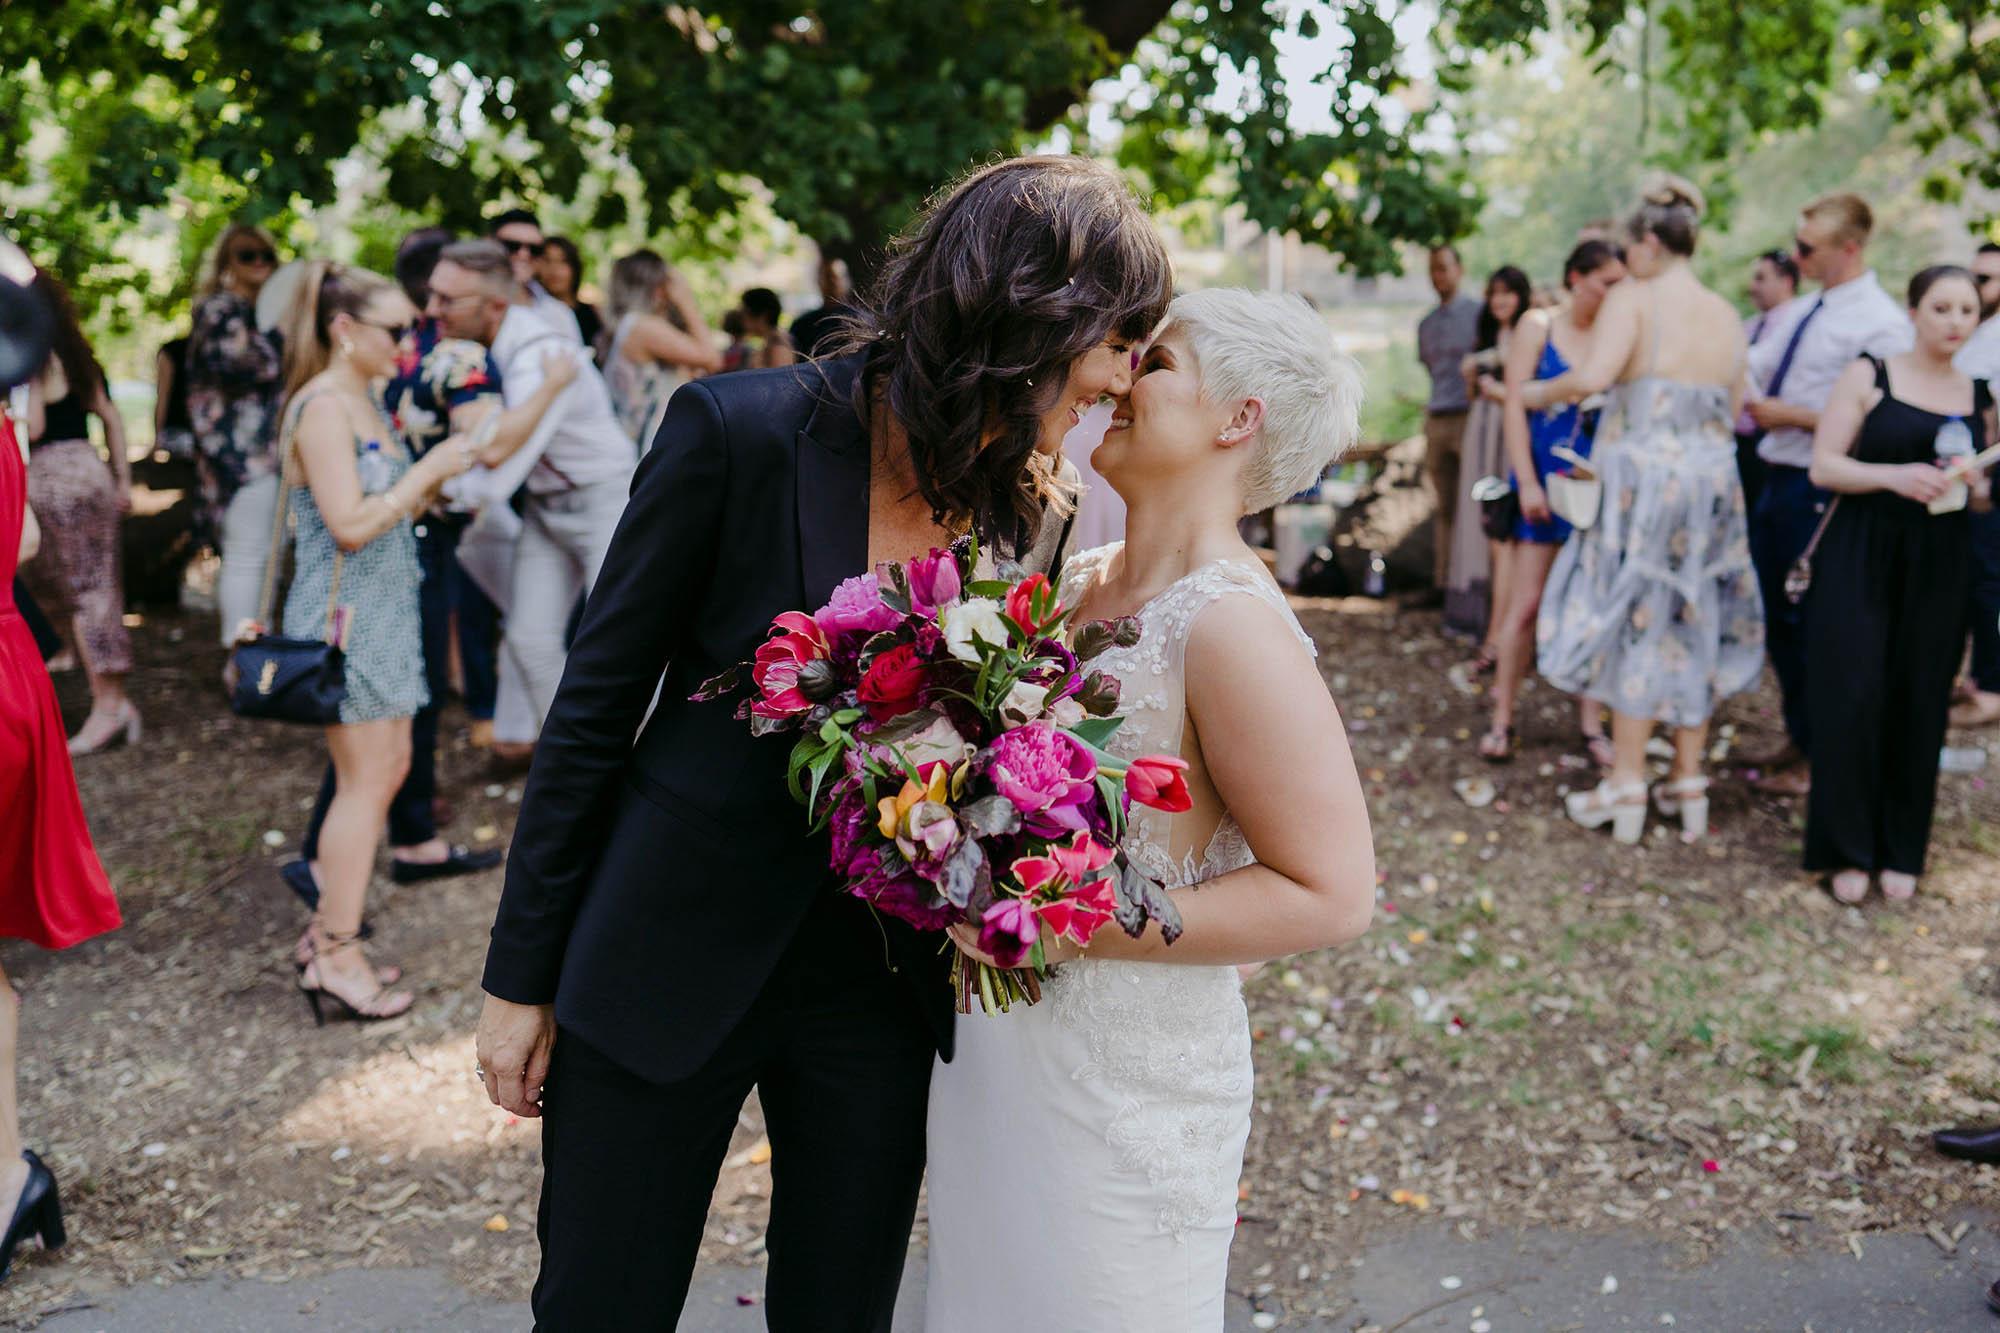 Michael Briggs - Melbourne Wedding Photographer - Queer Wedding